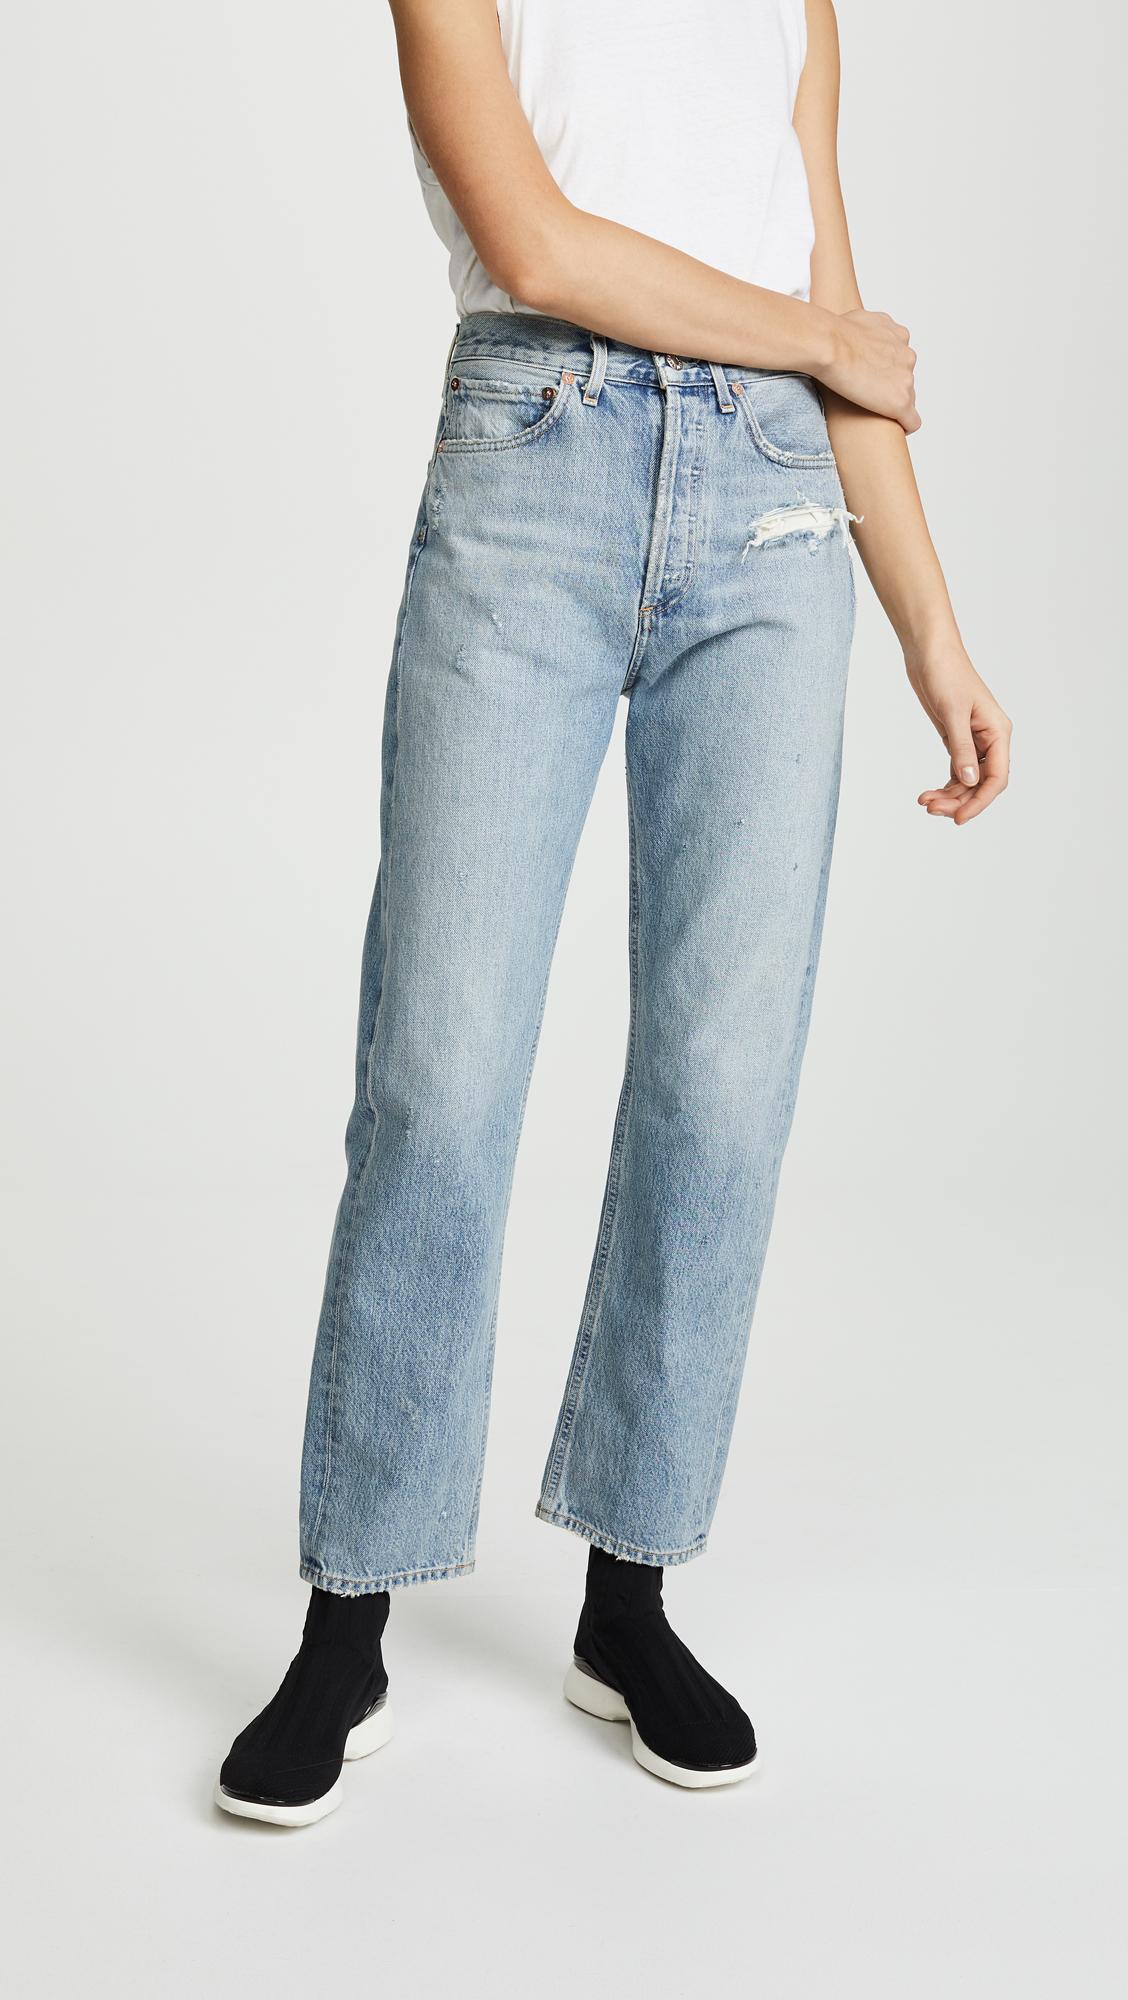 89daa70d78559a AGOLDE 90s Fit Mid Rise Jeans   SHOPBOP